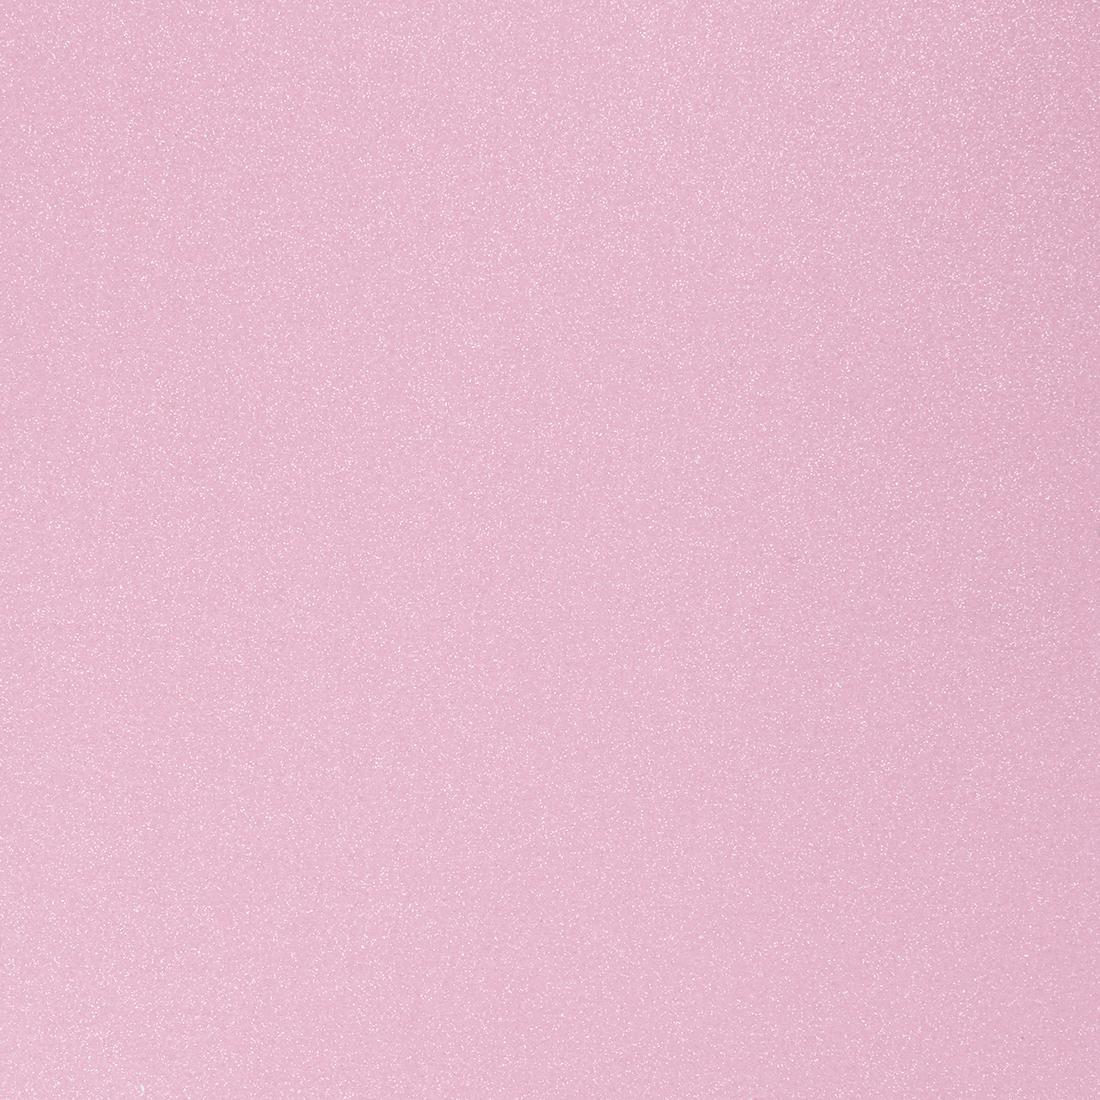 Glitter Cotton Pink Craft Fabric